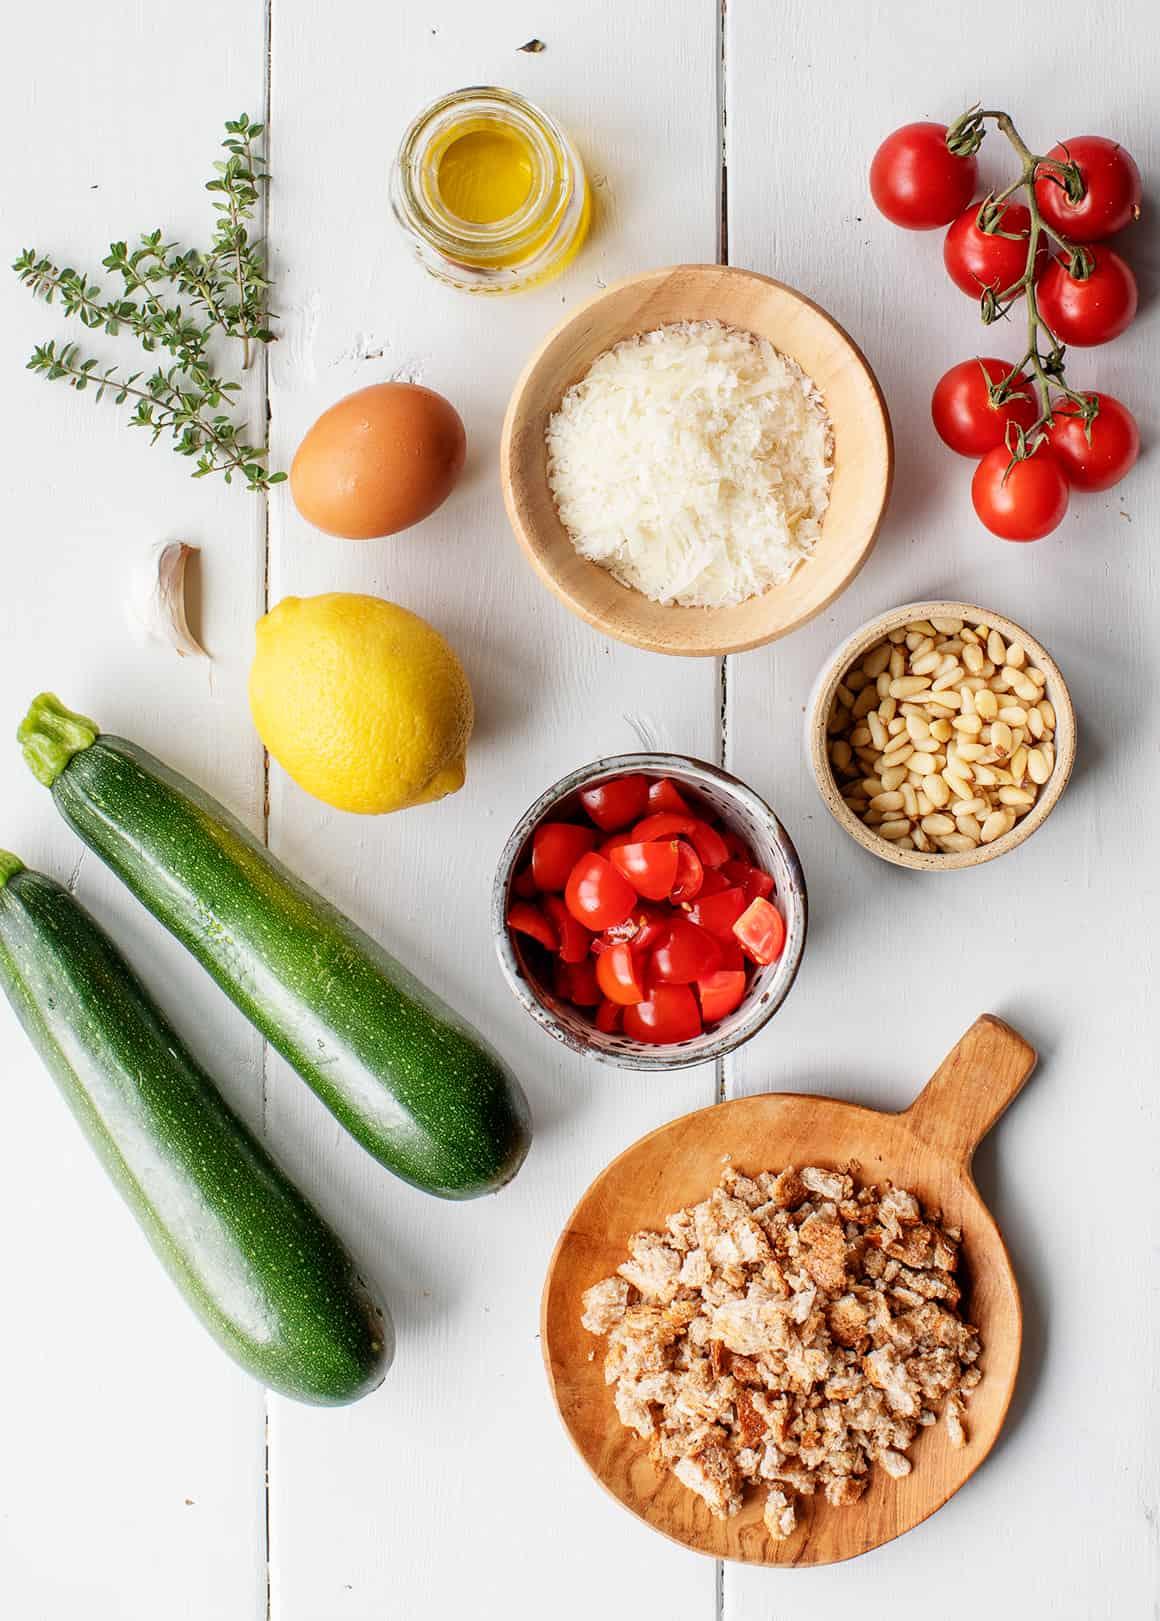 Stuffed zucchini boats ingredients